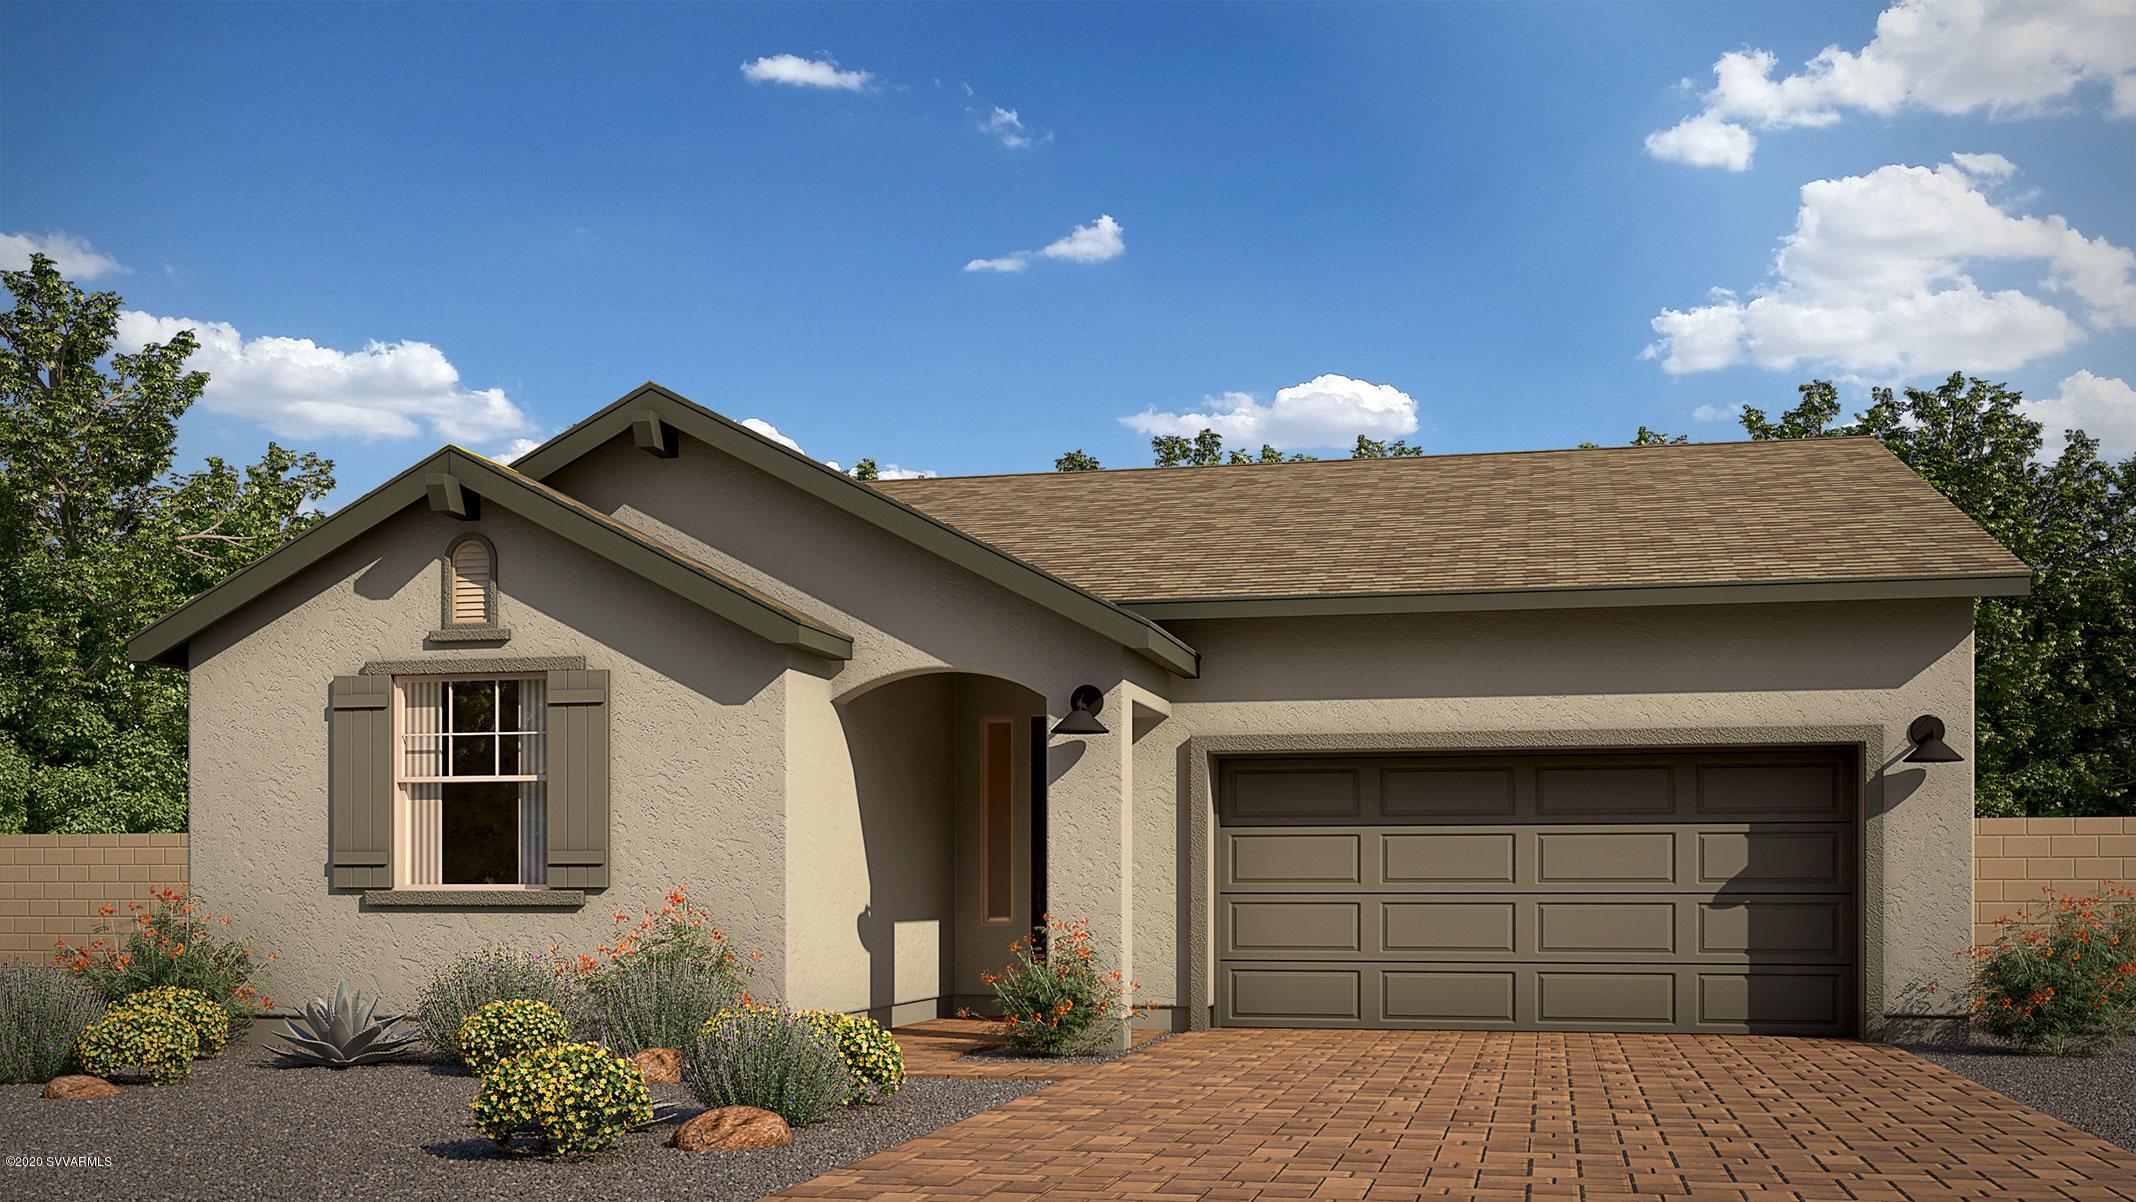 458 Miner's Gulch Drive Clarkdale, AZ 86324